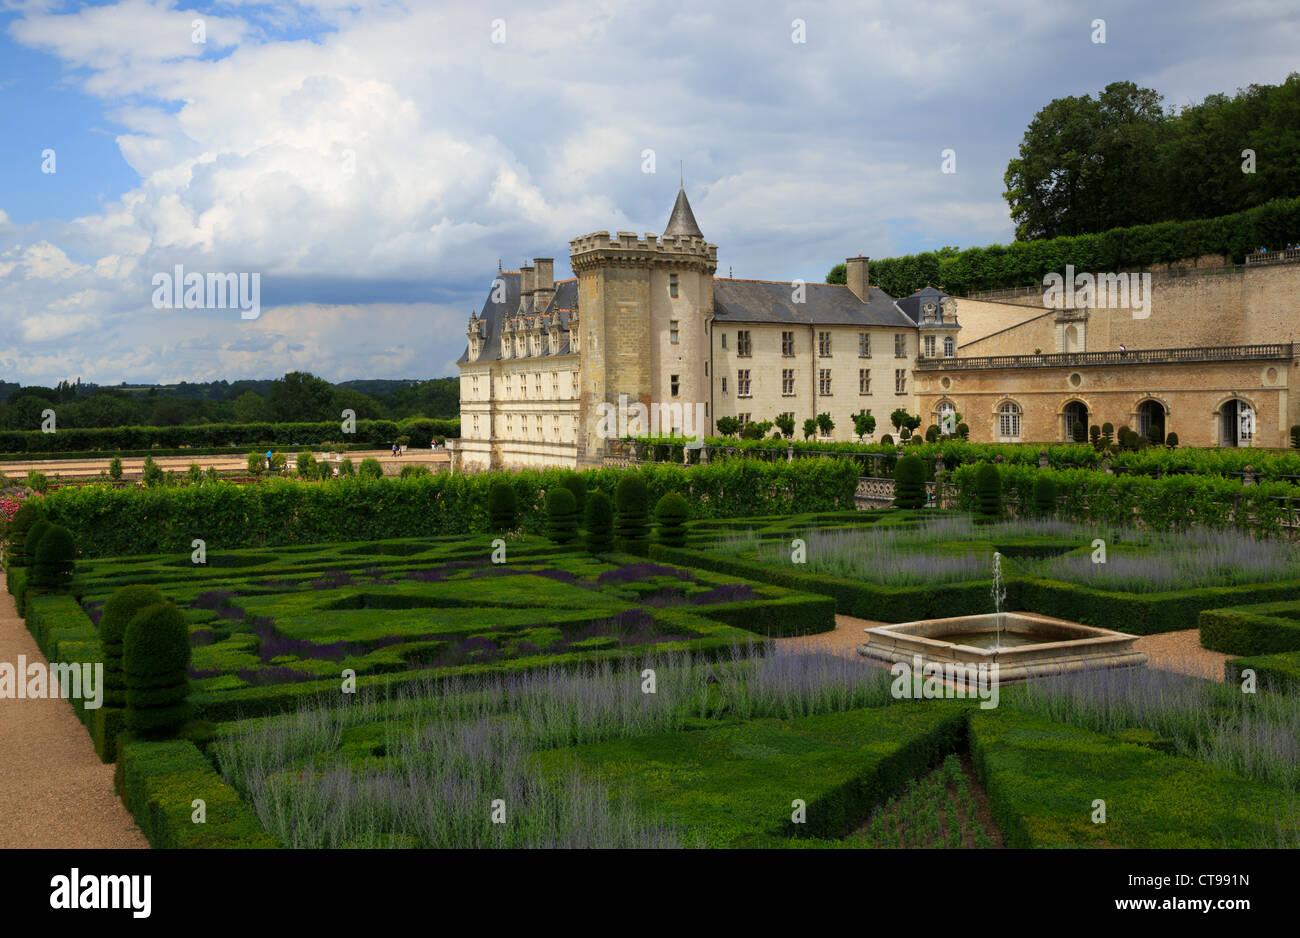 ornamental garden chateau de villandry stock photos. Black Bedroom Furniture Sets. Home Design Ideas